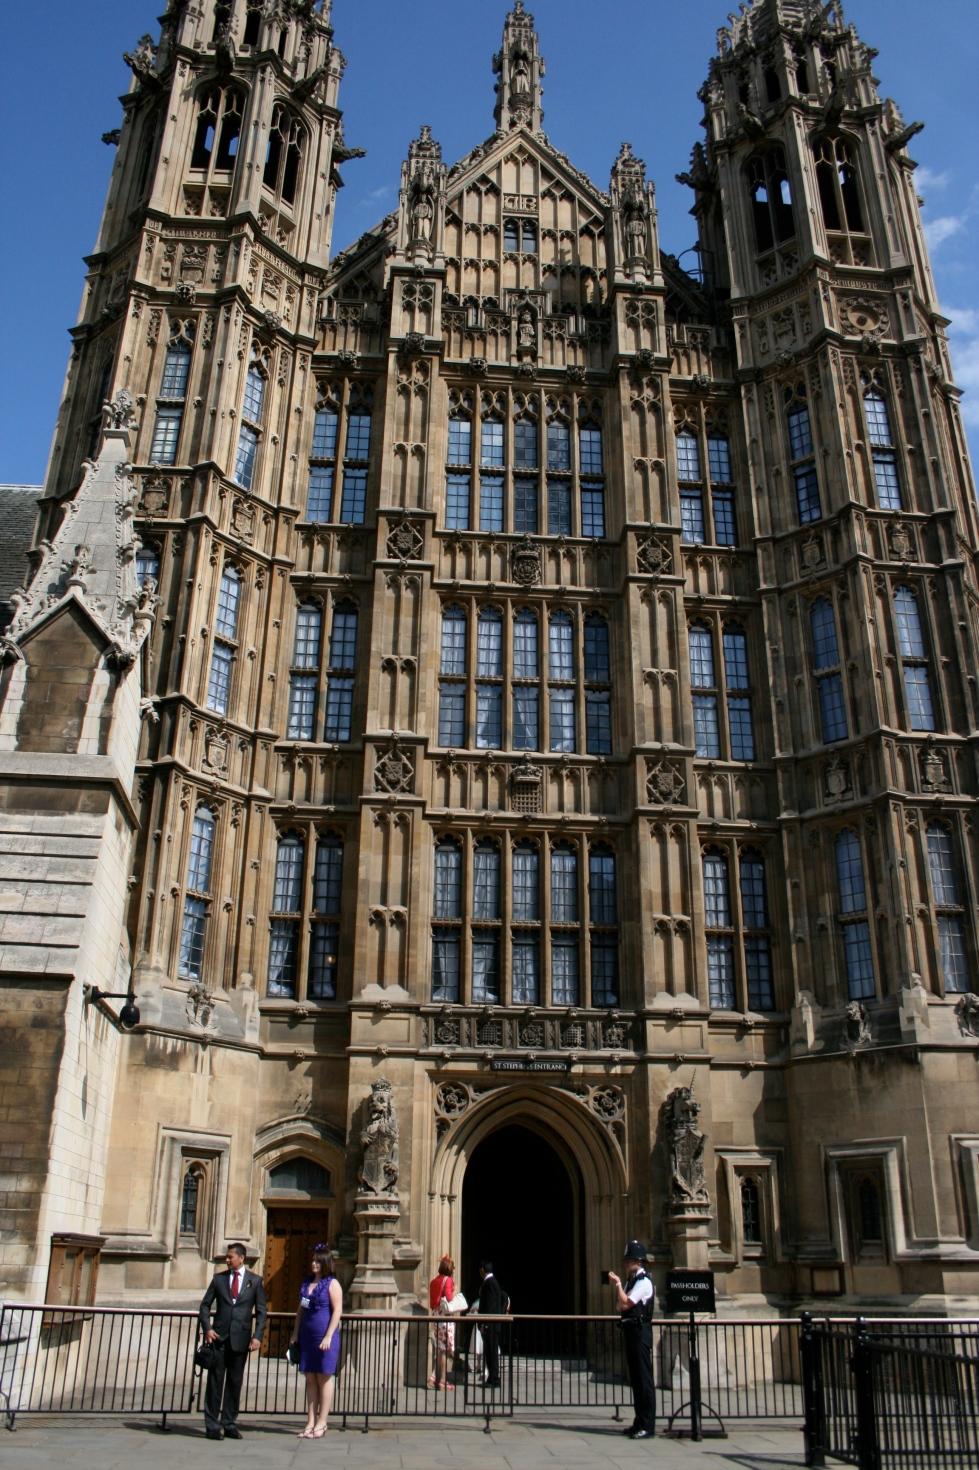 parliament, london, england, travel, photography, photos, travel photography, travel photos, london travel photography, london travel photos, england travel photography, england travel photos